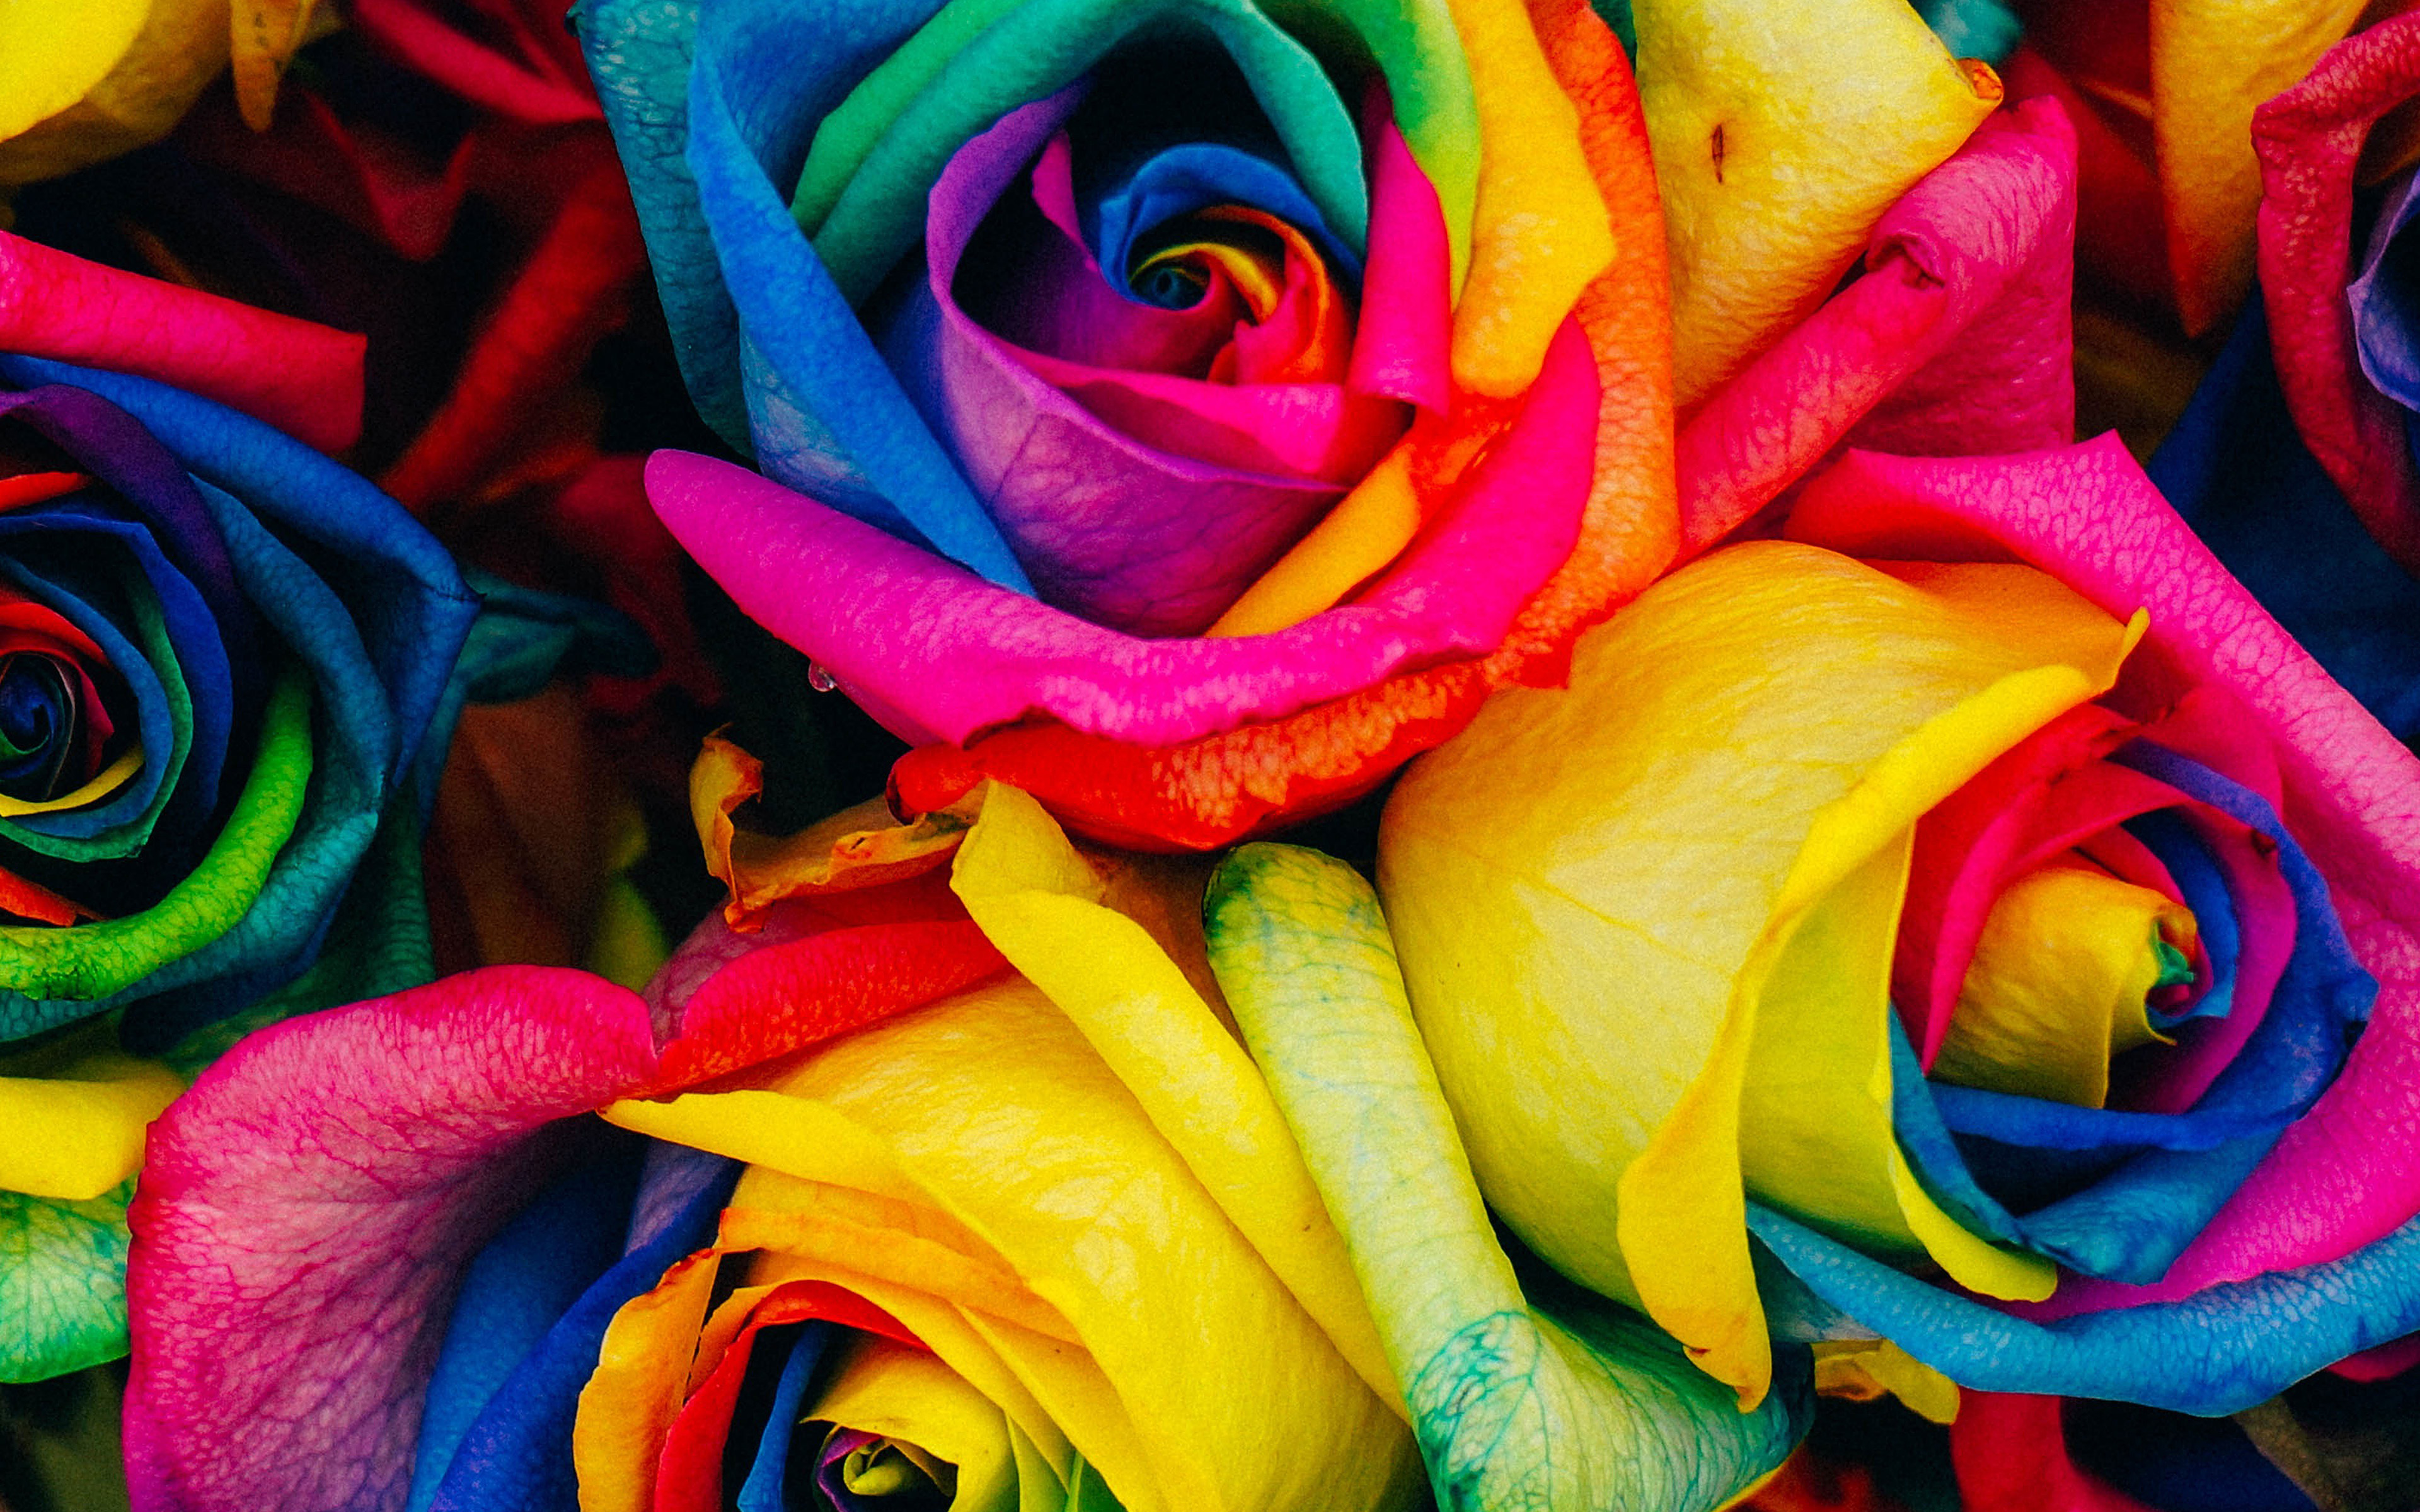 As98 Flower Rose Color Rainbow Art Nature Wallpaper